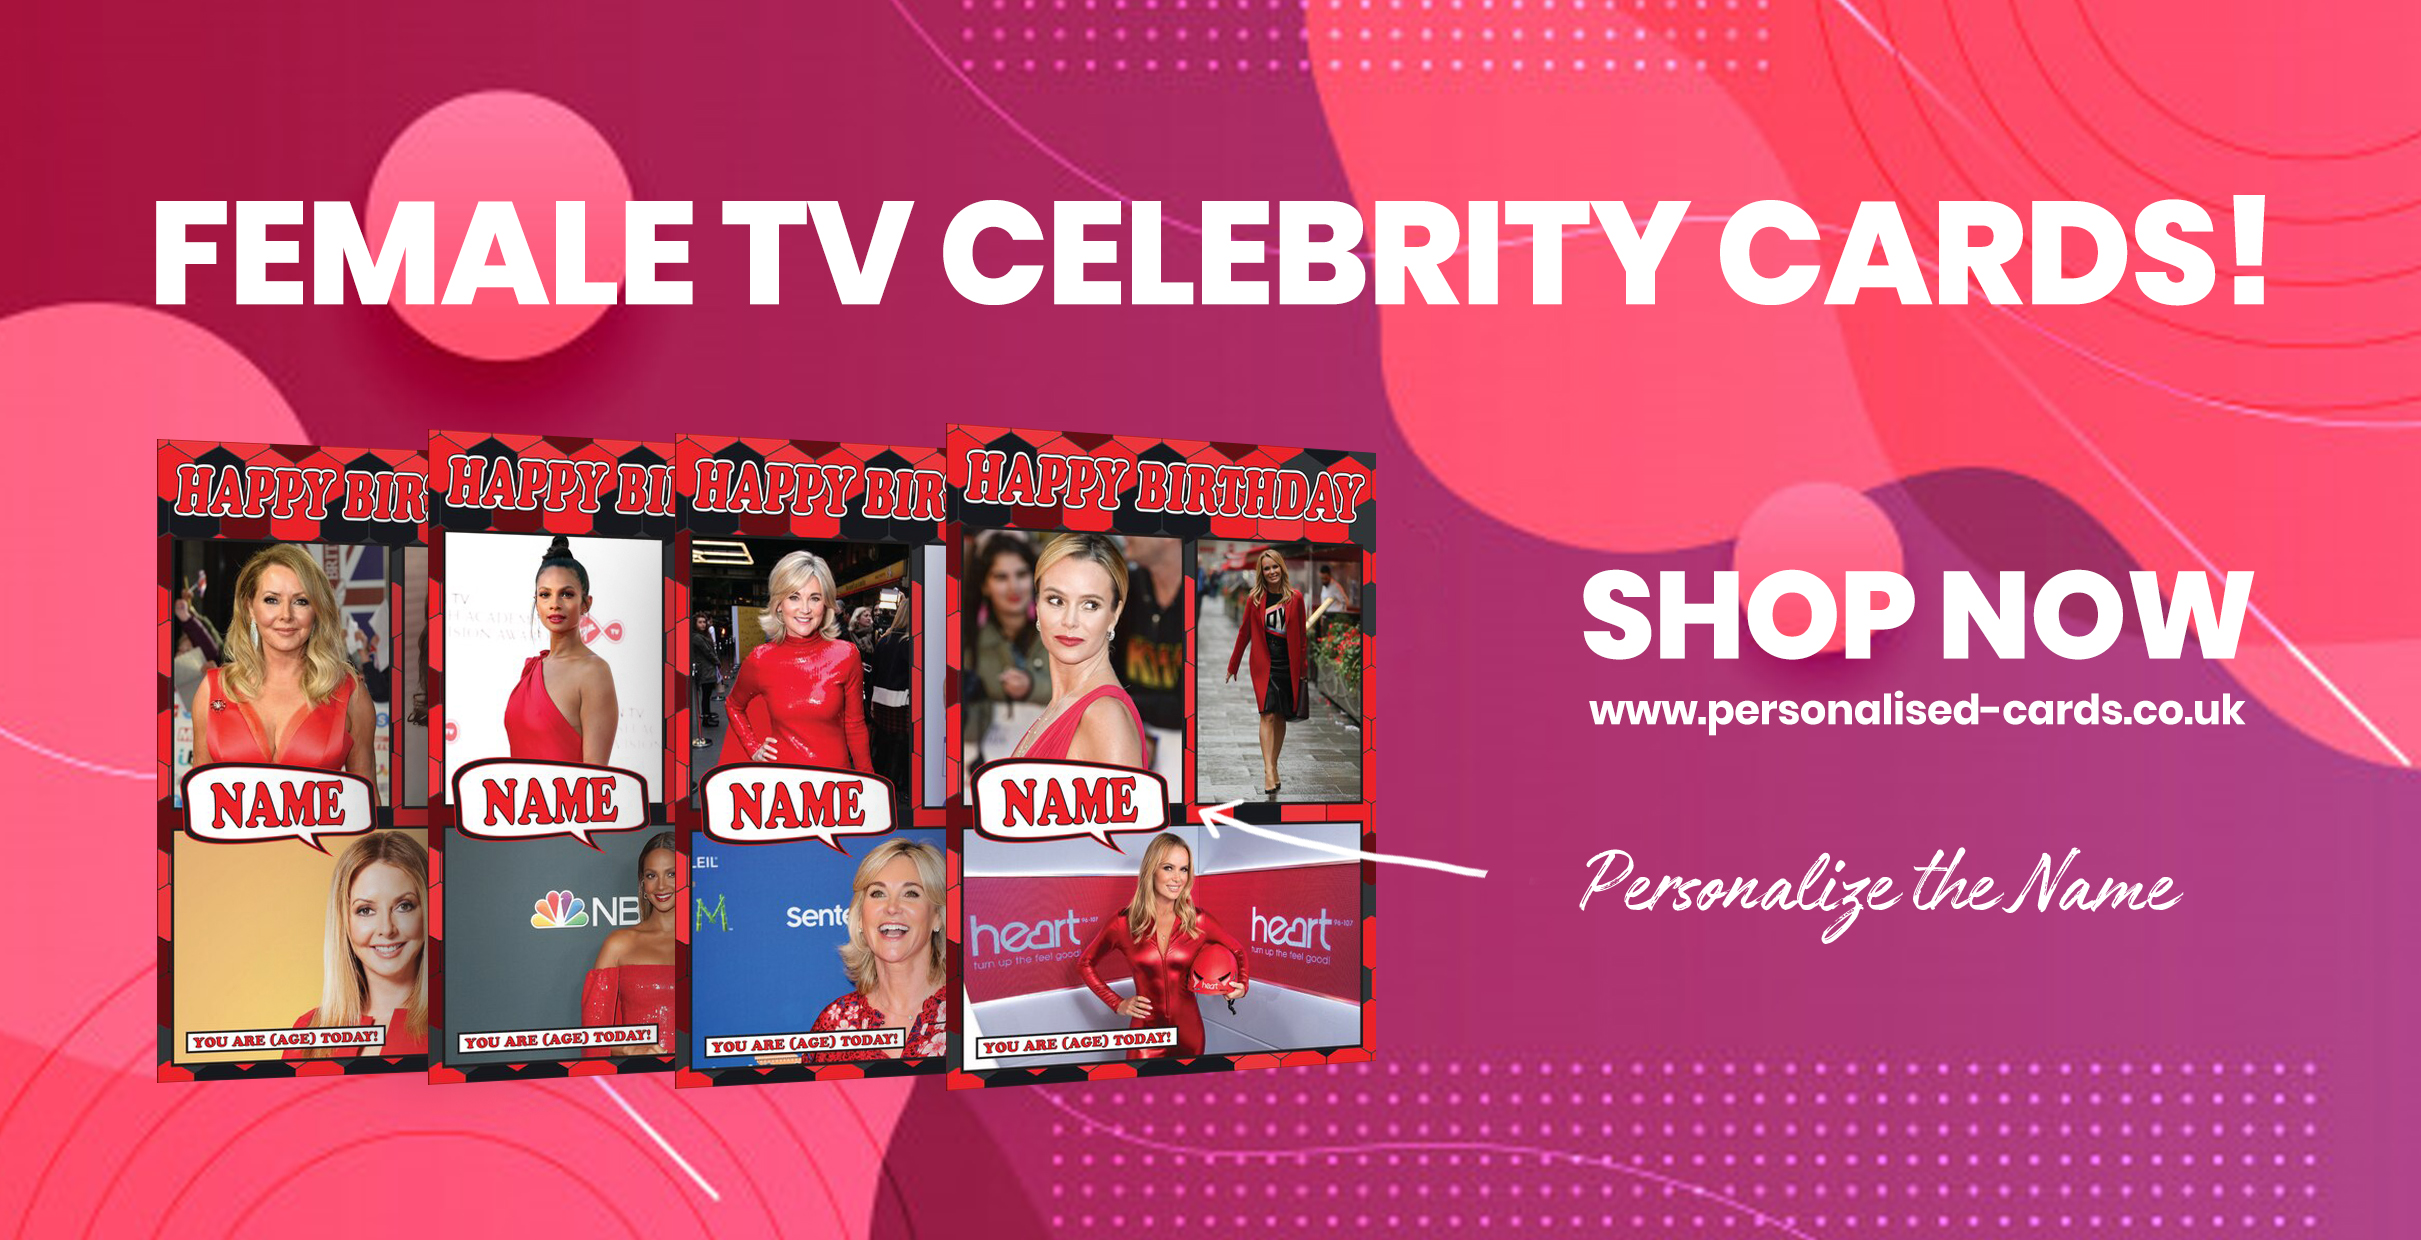 female-tv-celebrity-cards.jpg